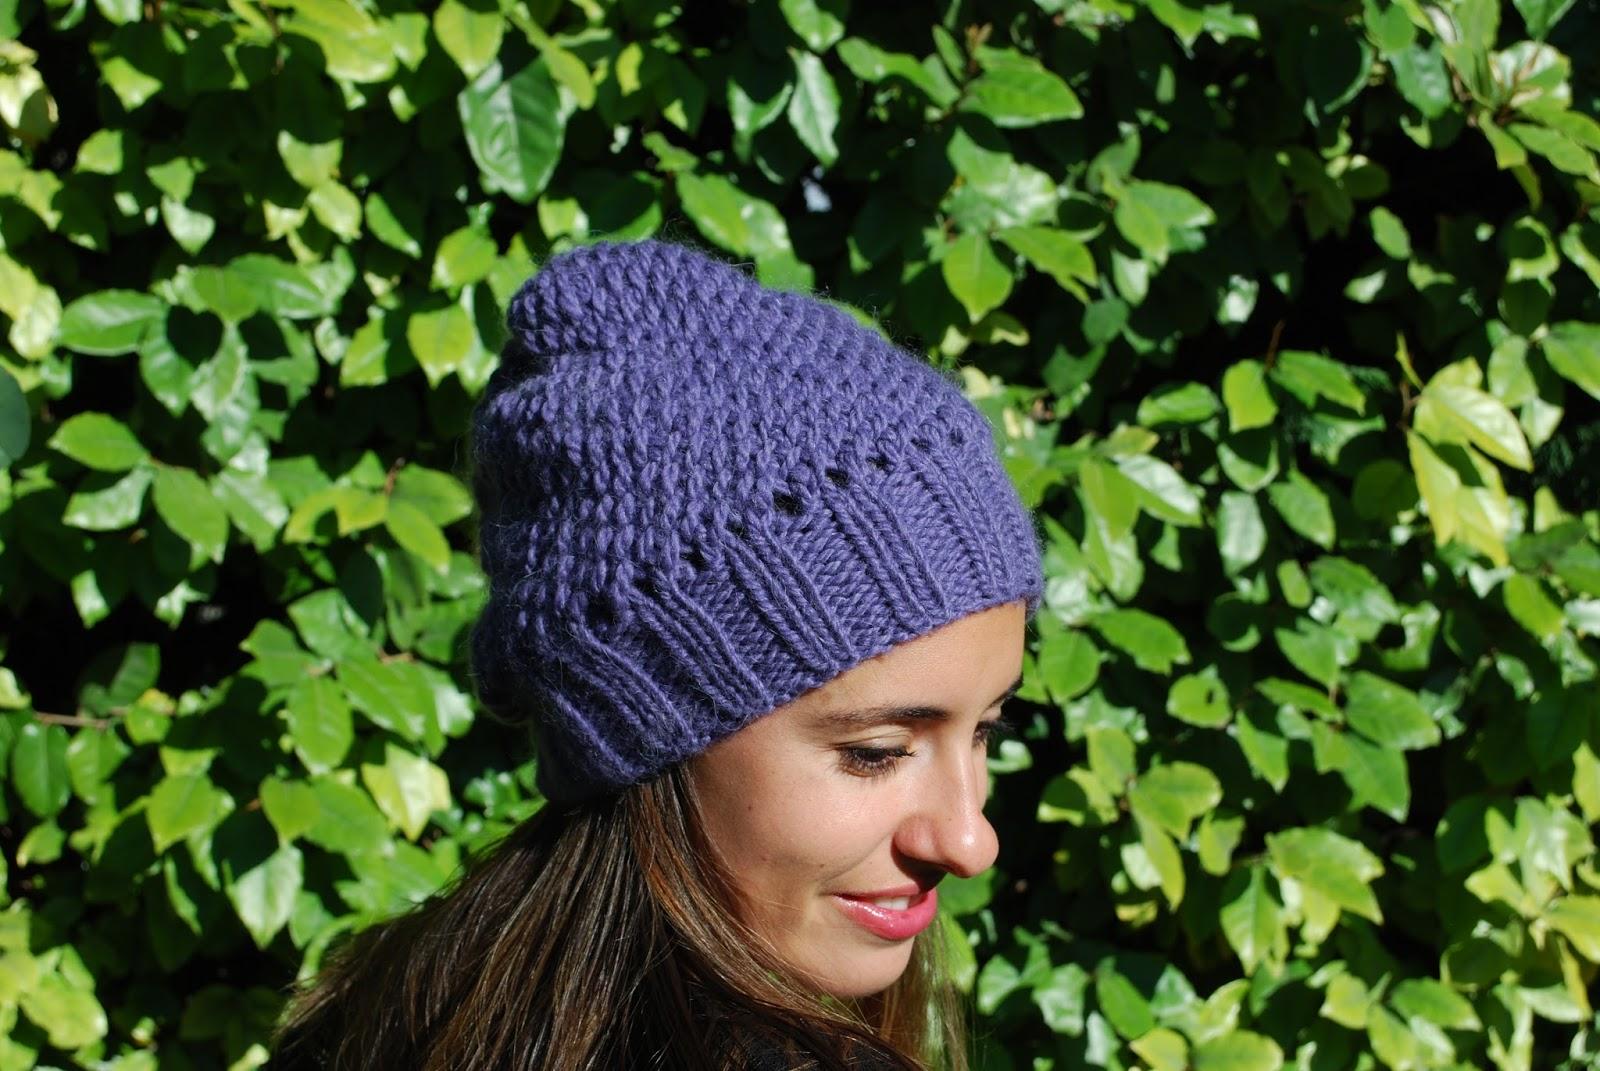 Carofoliz bonnet facile en andes de drops design - Tricot aiguilles circulaires magic loop ...